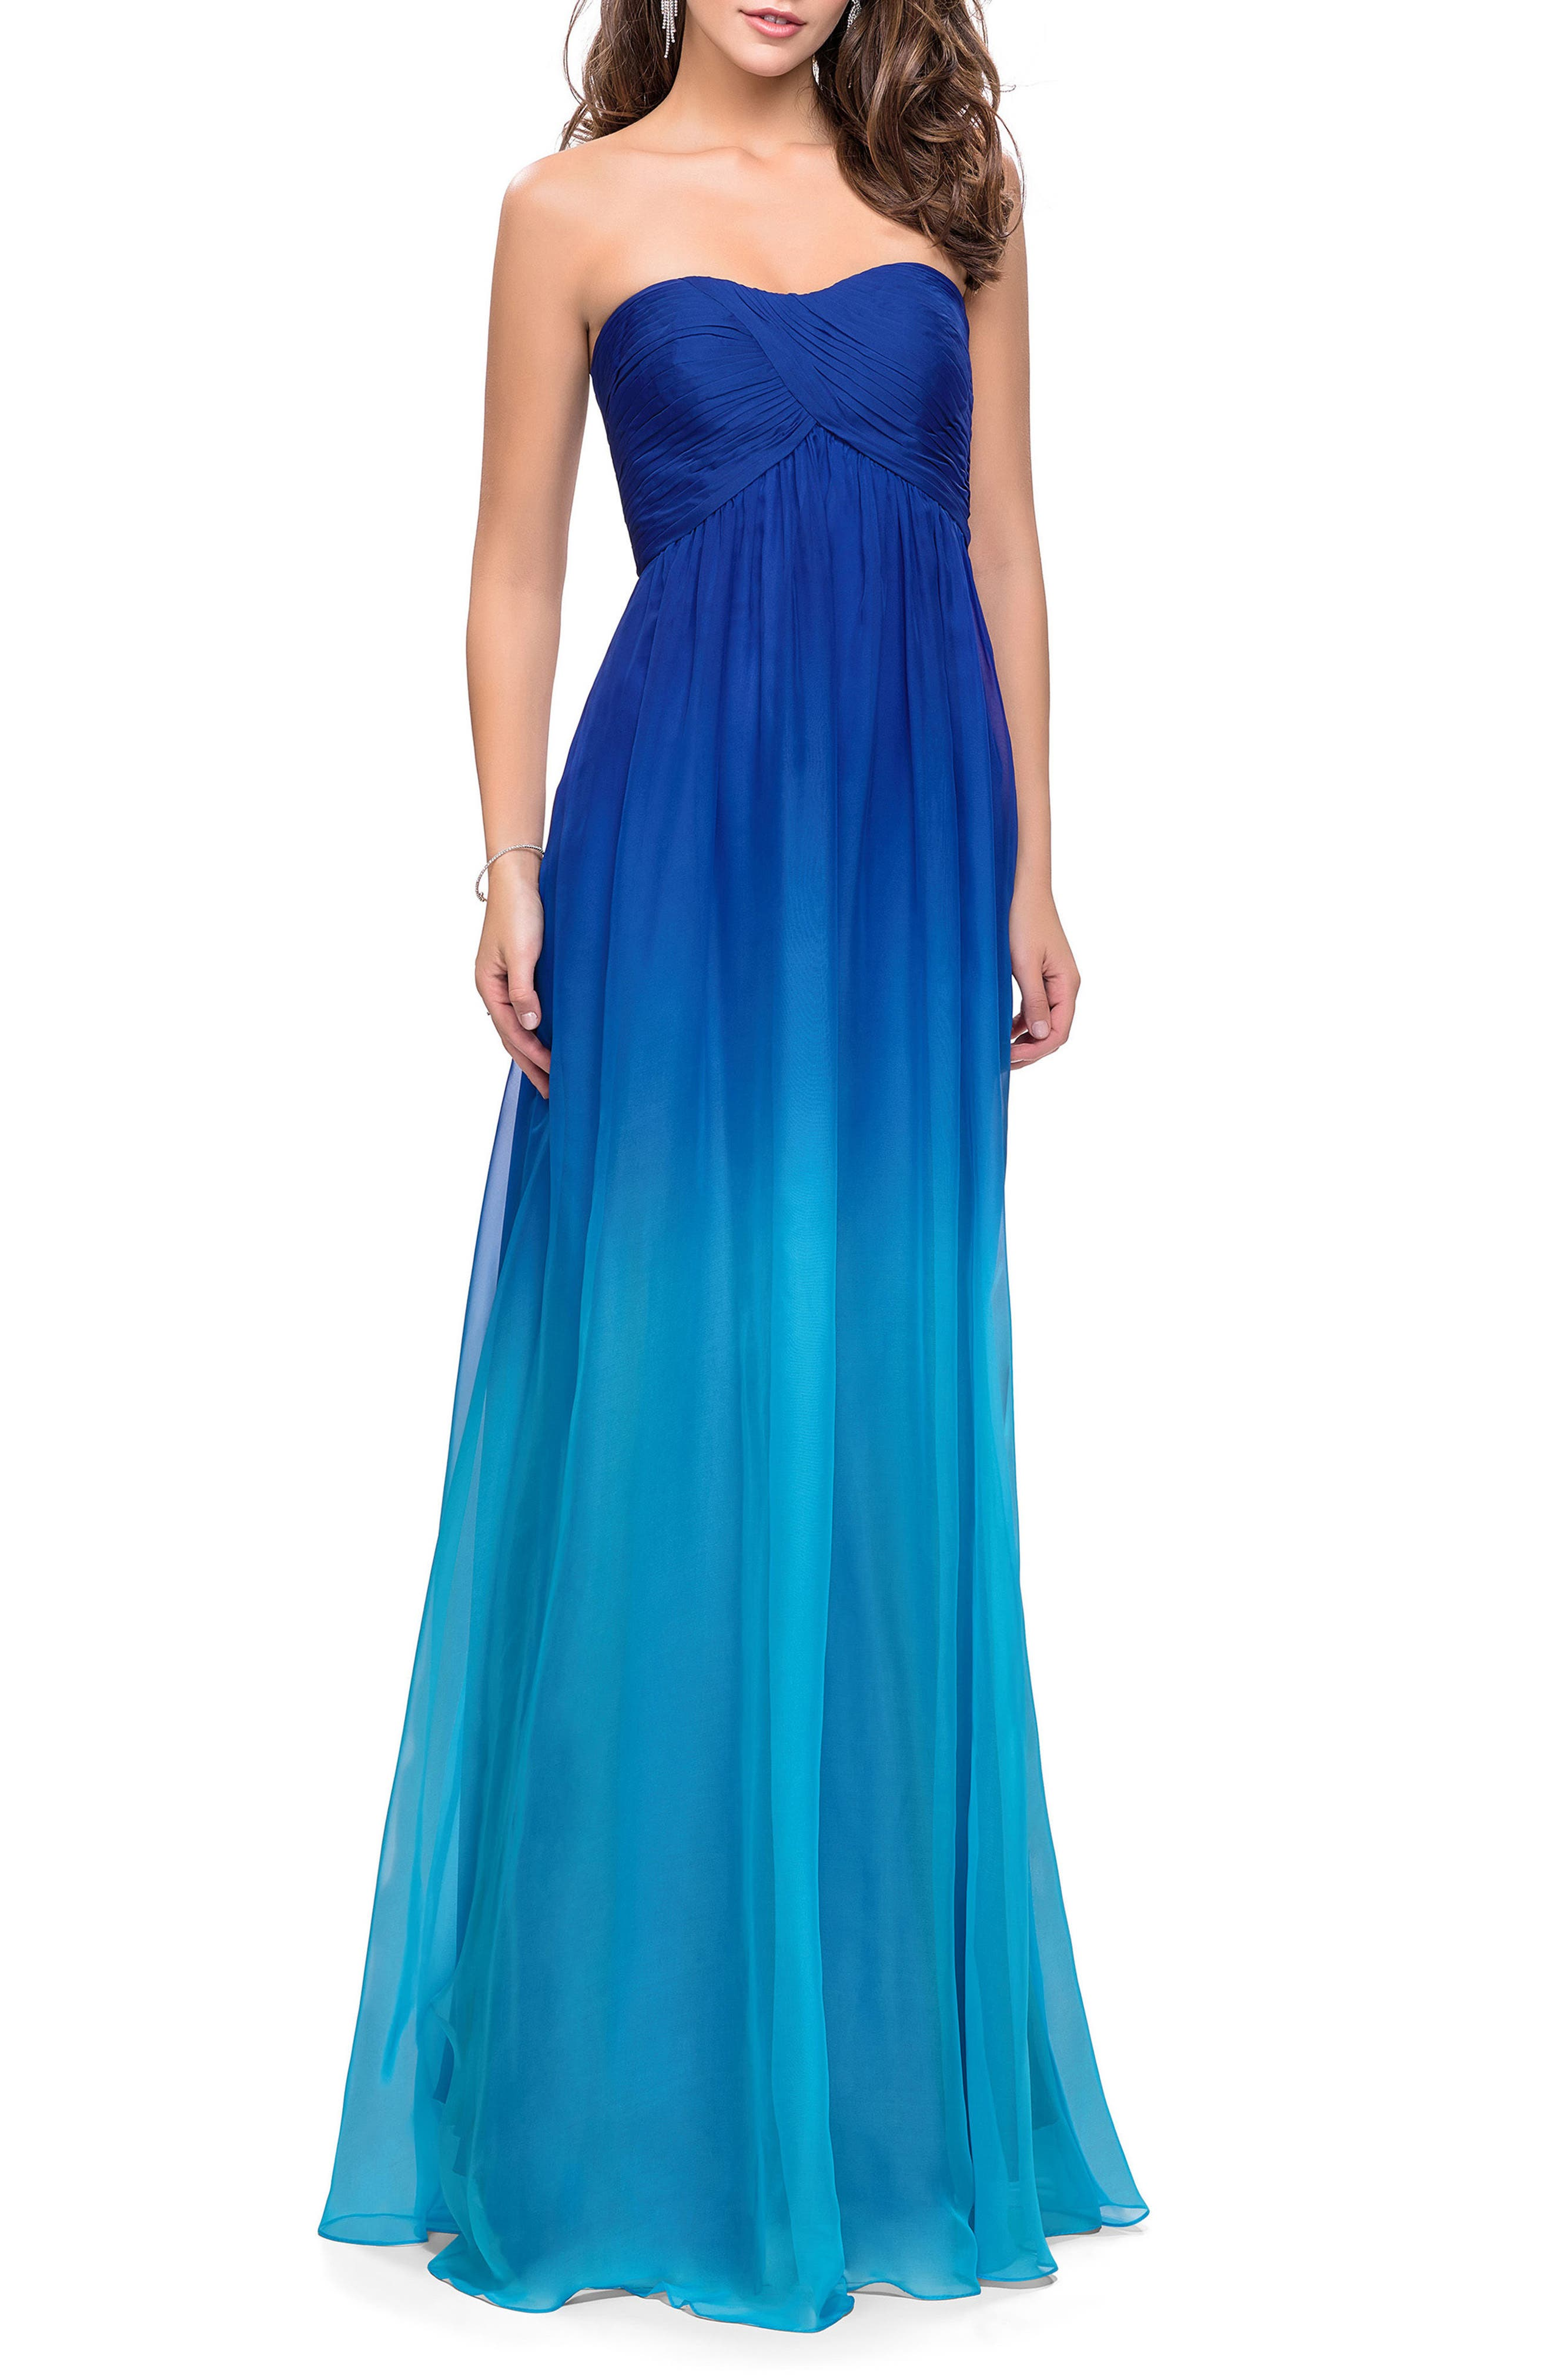 2018 Prom Dresses | Nordstrom